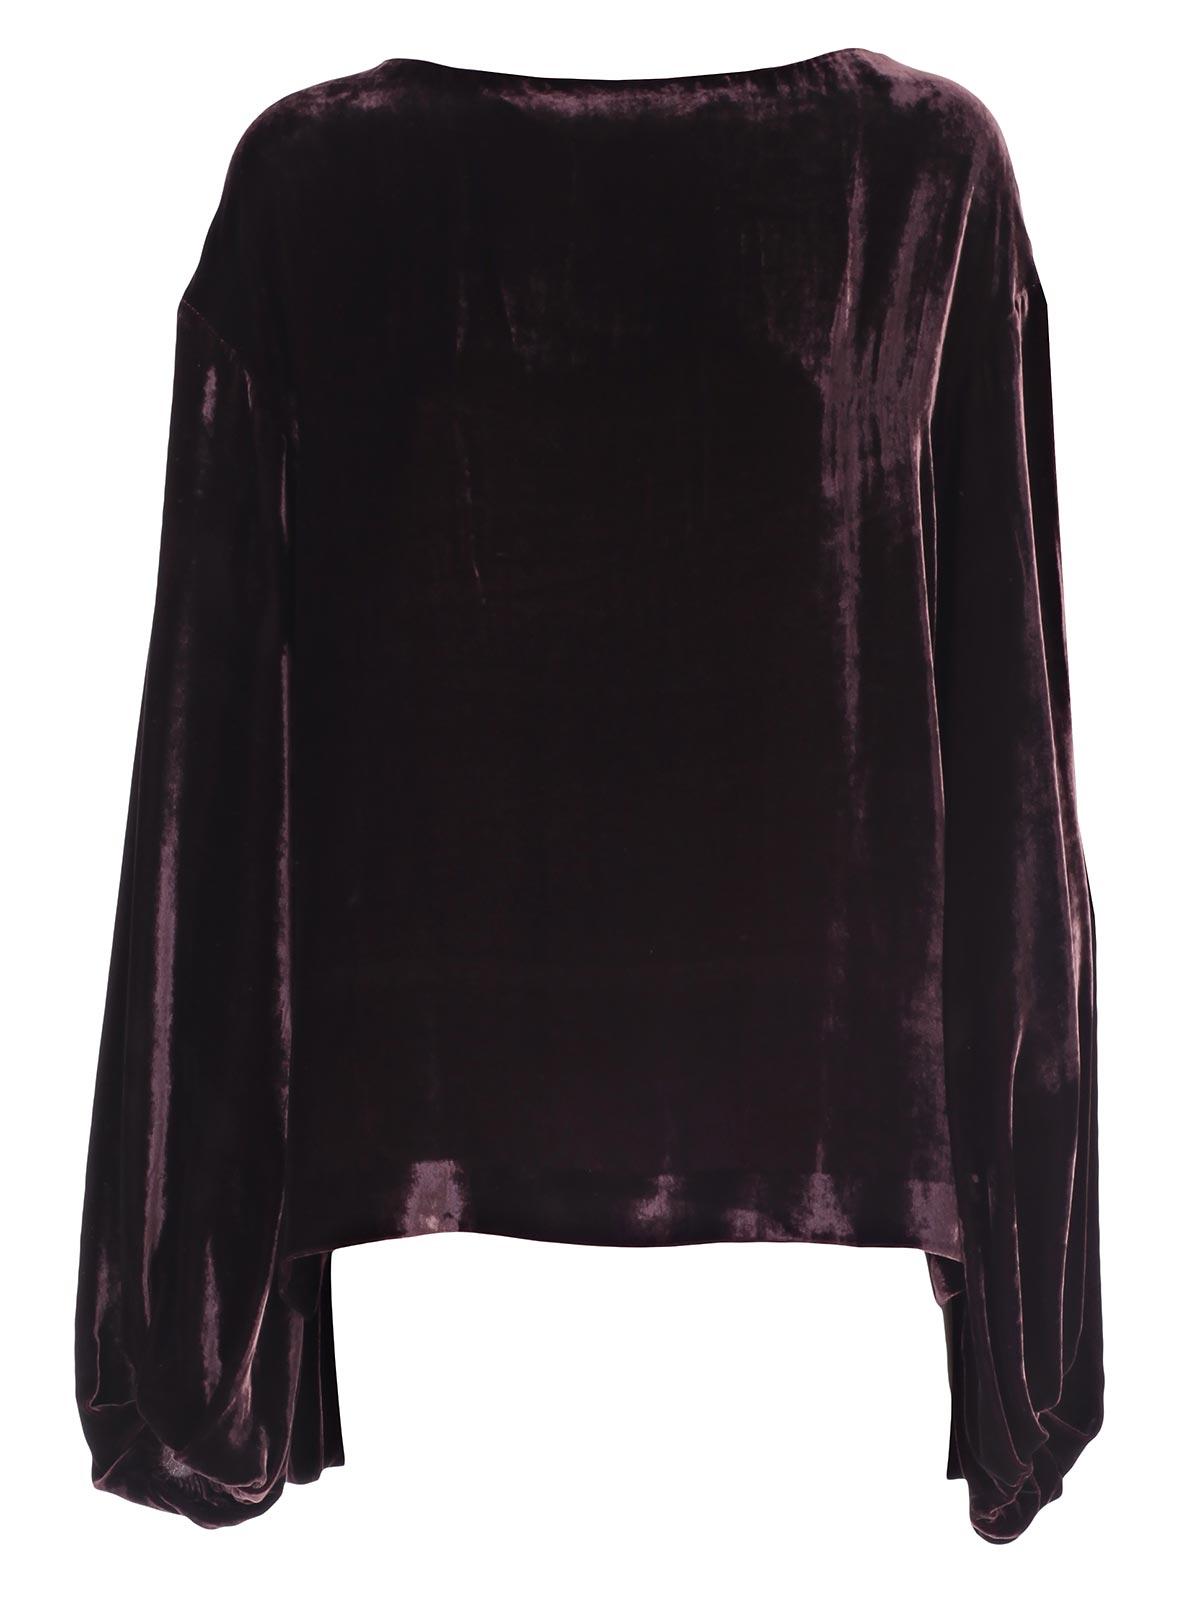 Mantu Shirts Ag1027 G22 622 Bordeaux Bernardelli Store